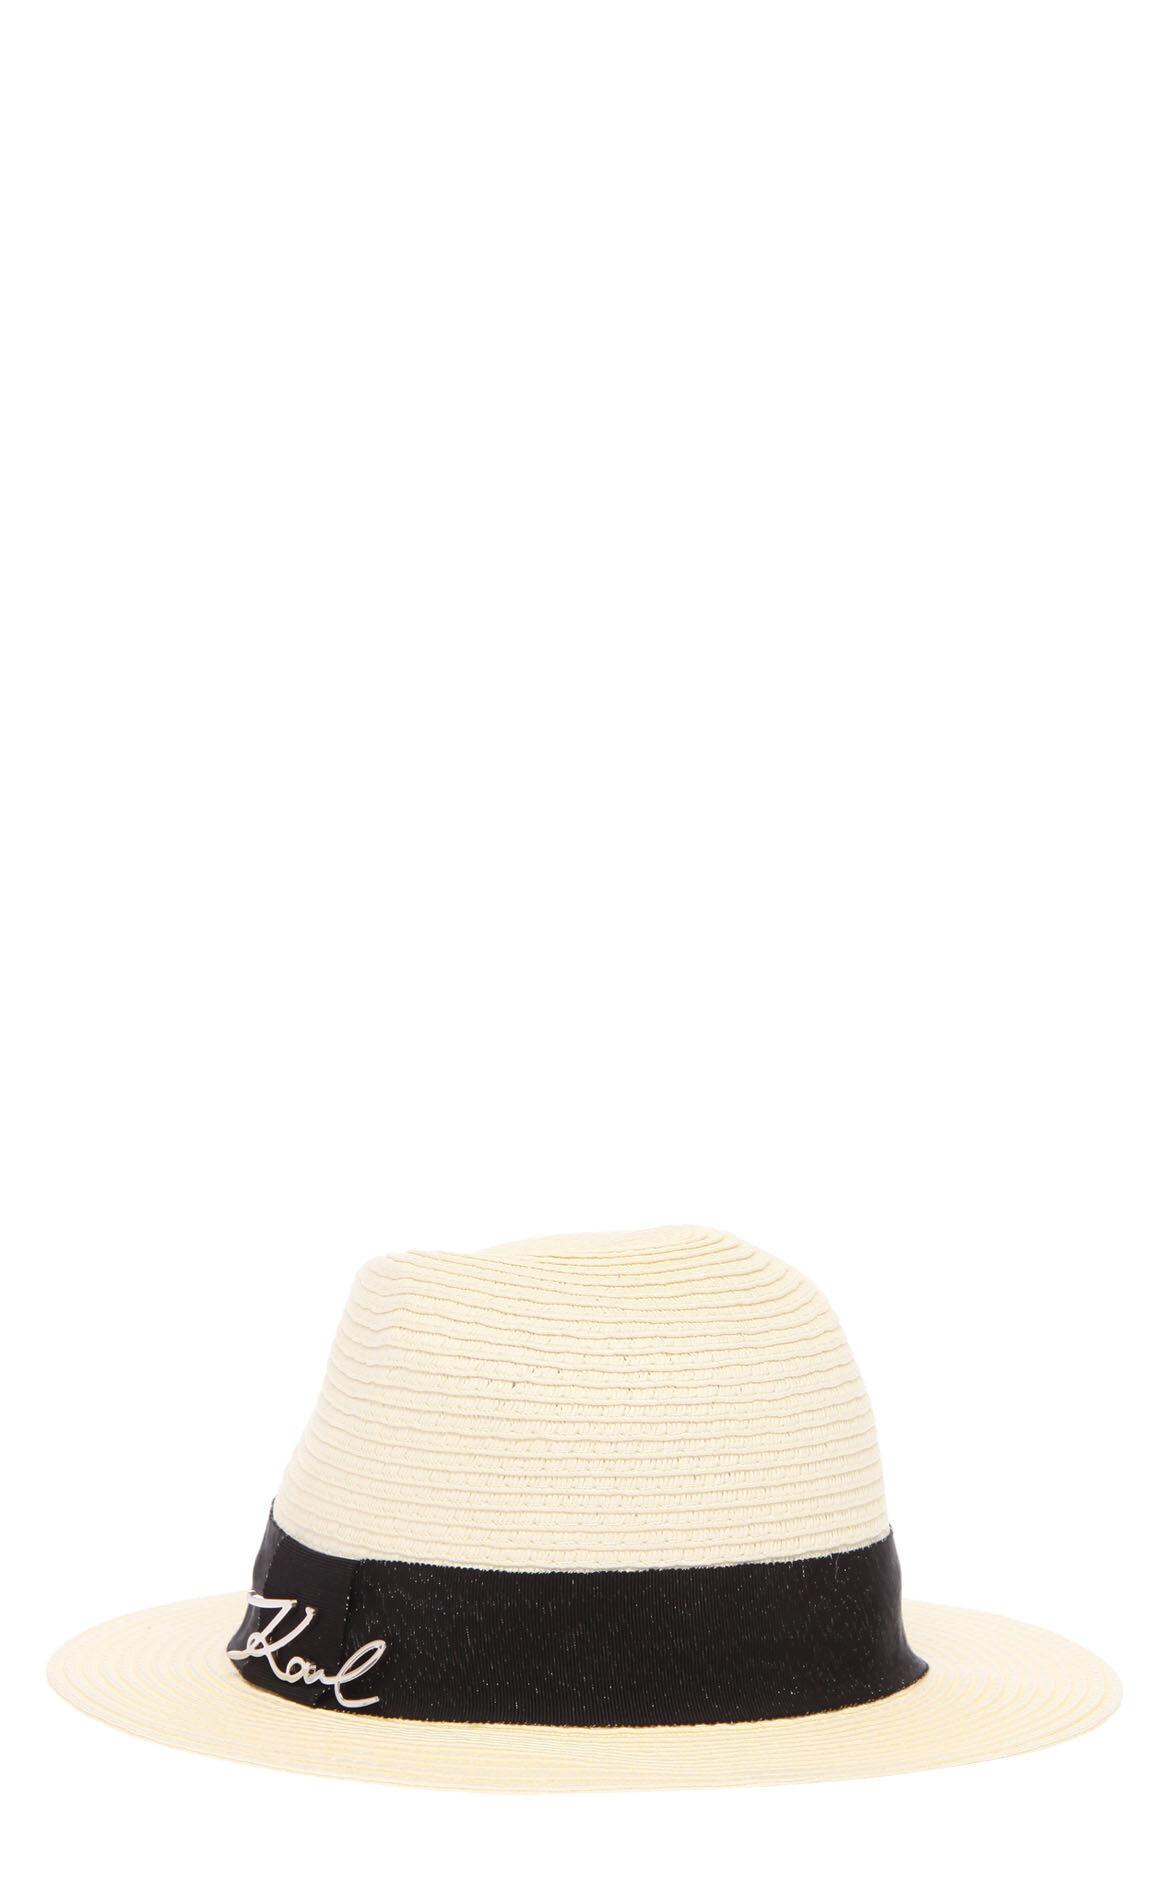 Karl Lagerfeld-Karl Lagerfeld Şapka